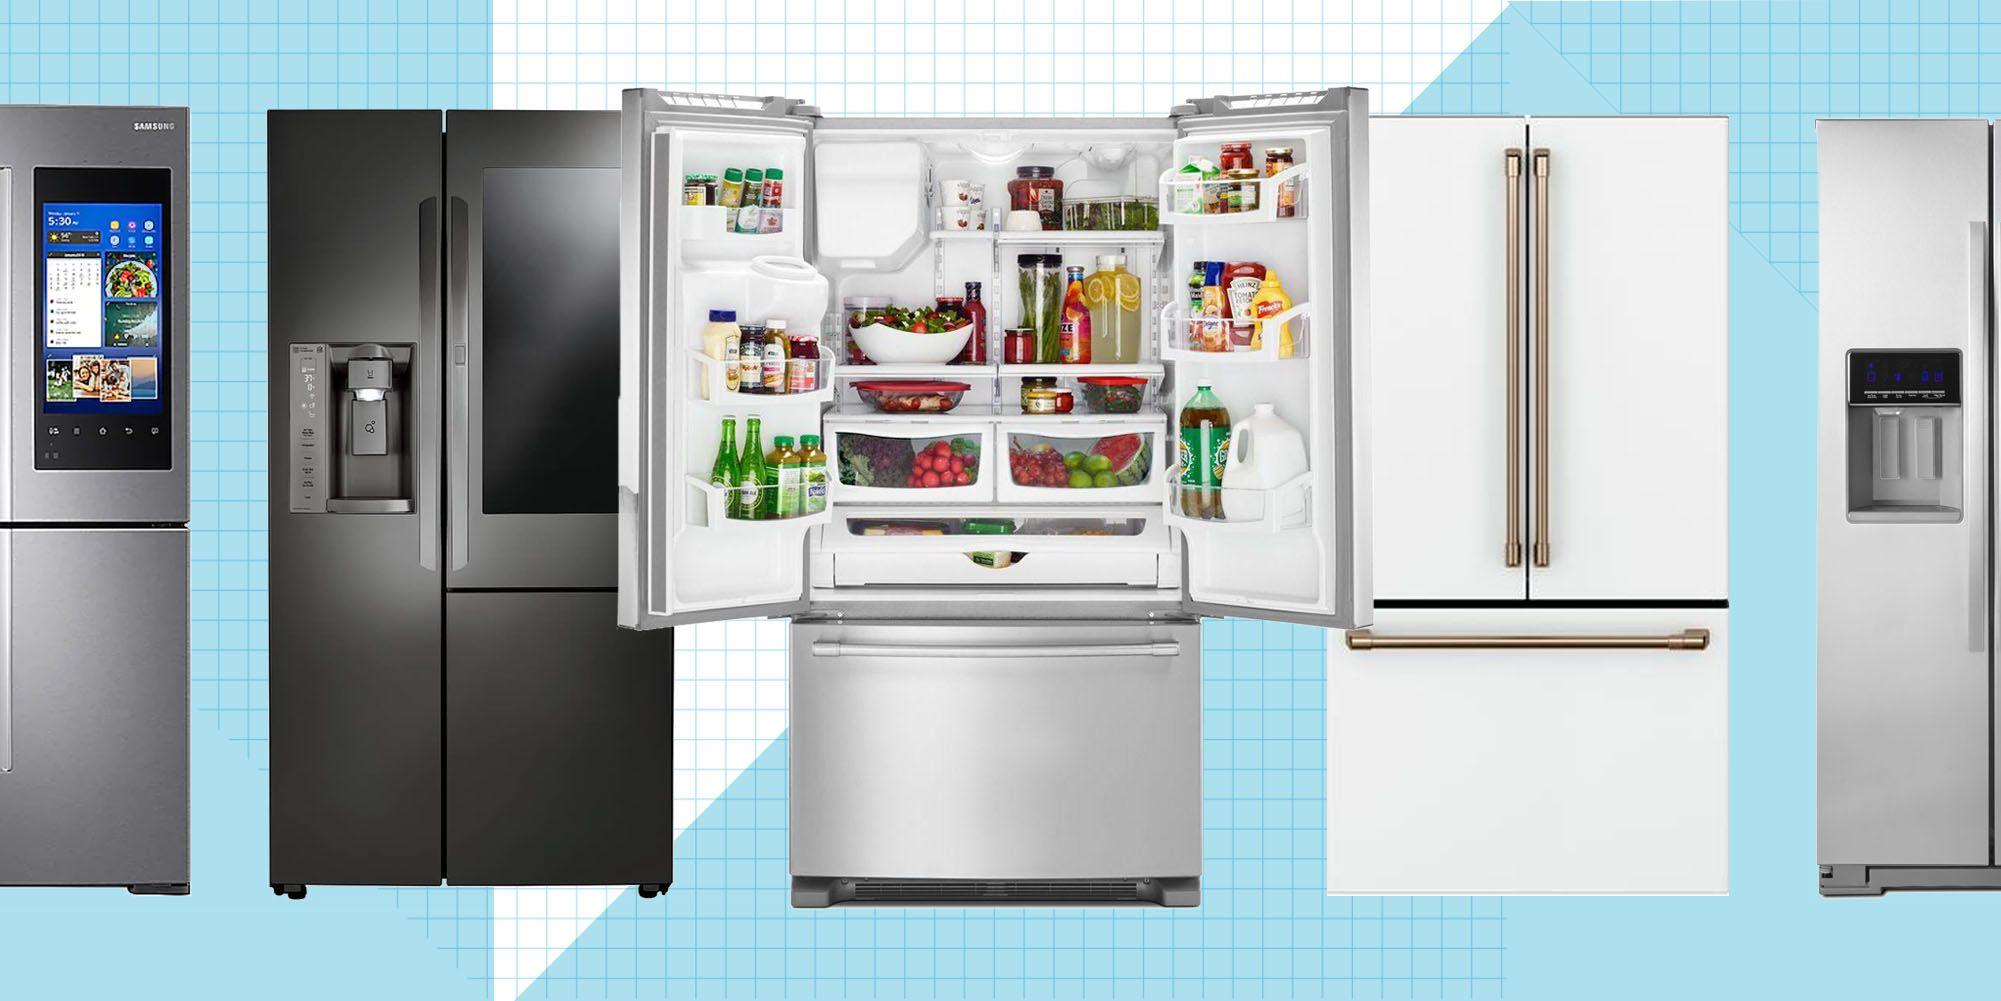 10 Best Refrigerators Reviews 2019 - Top Rated Fridges